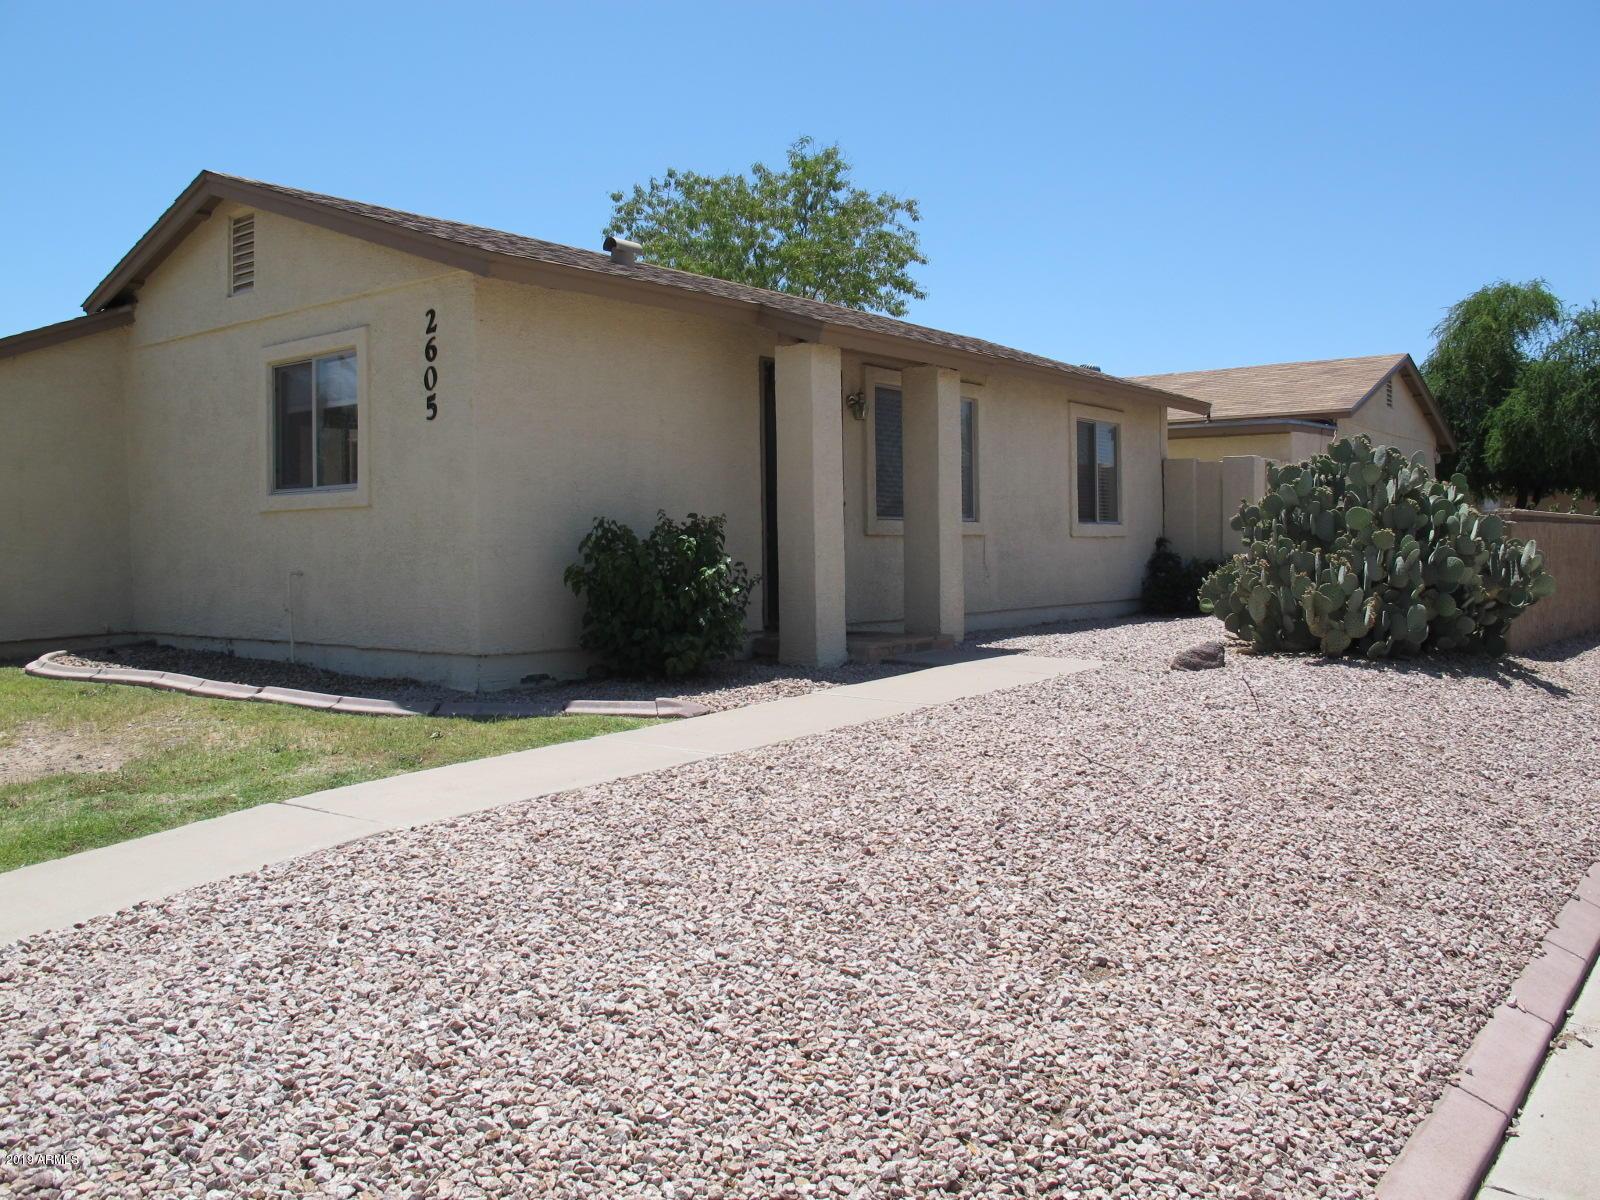 Photo of 2605 E 10TH Street, Tempe, AZ 85281